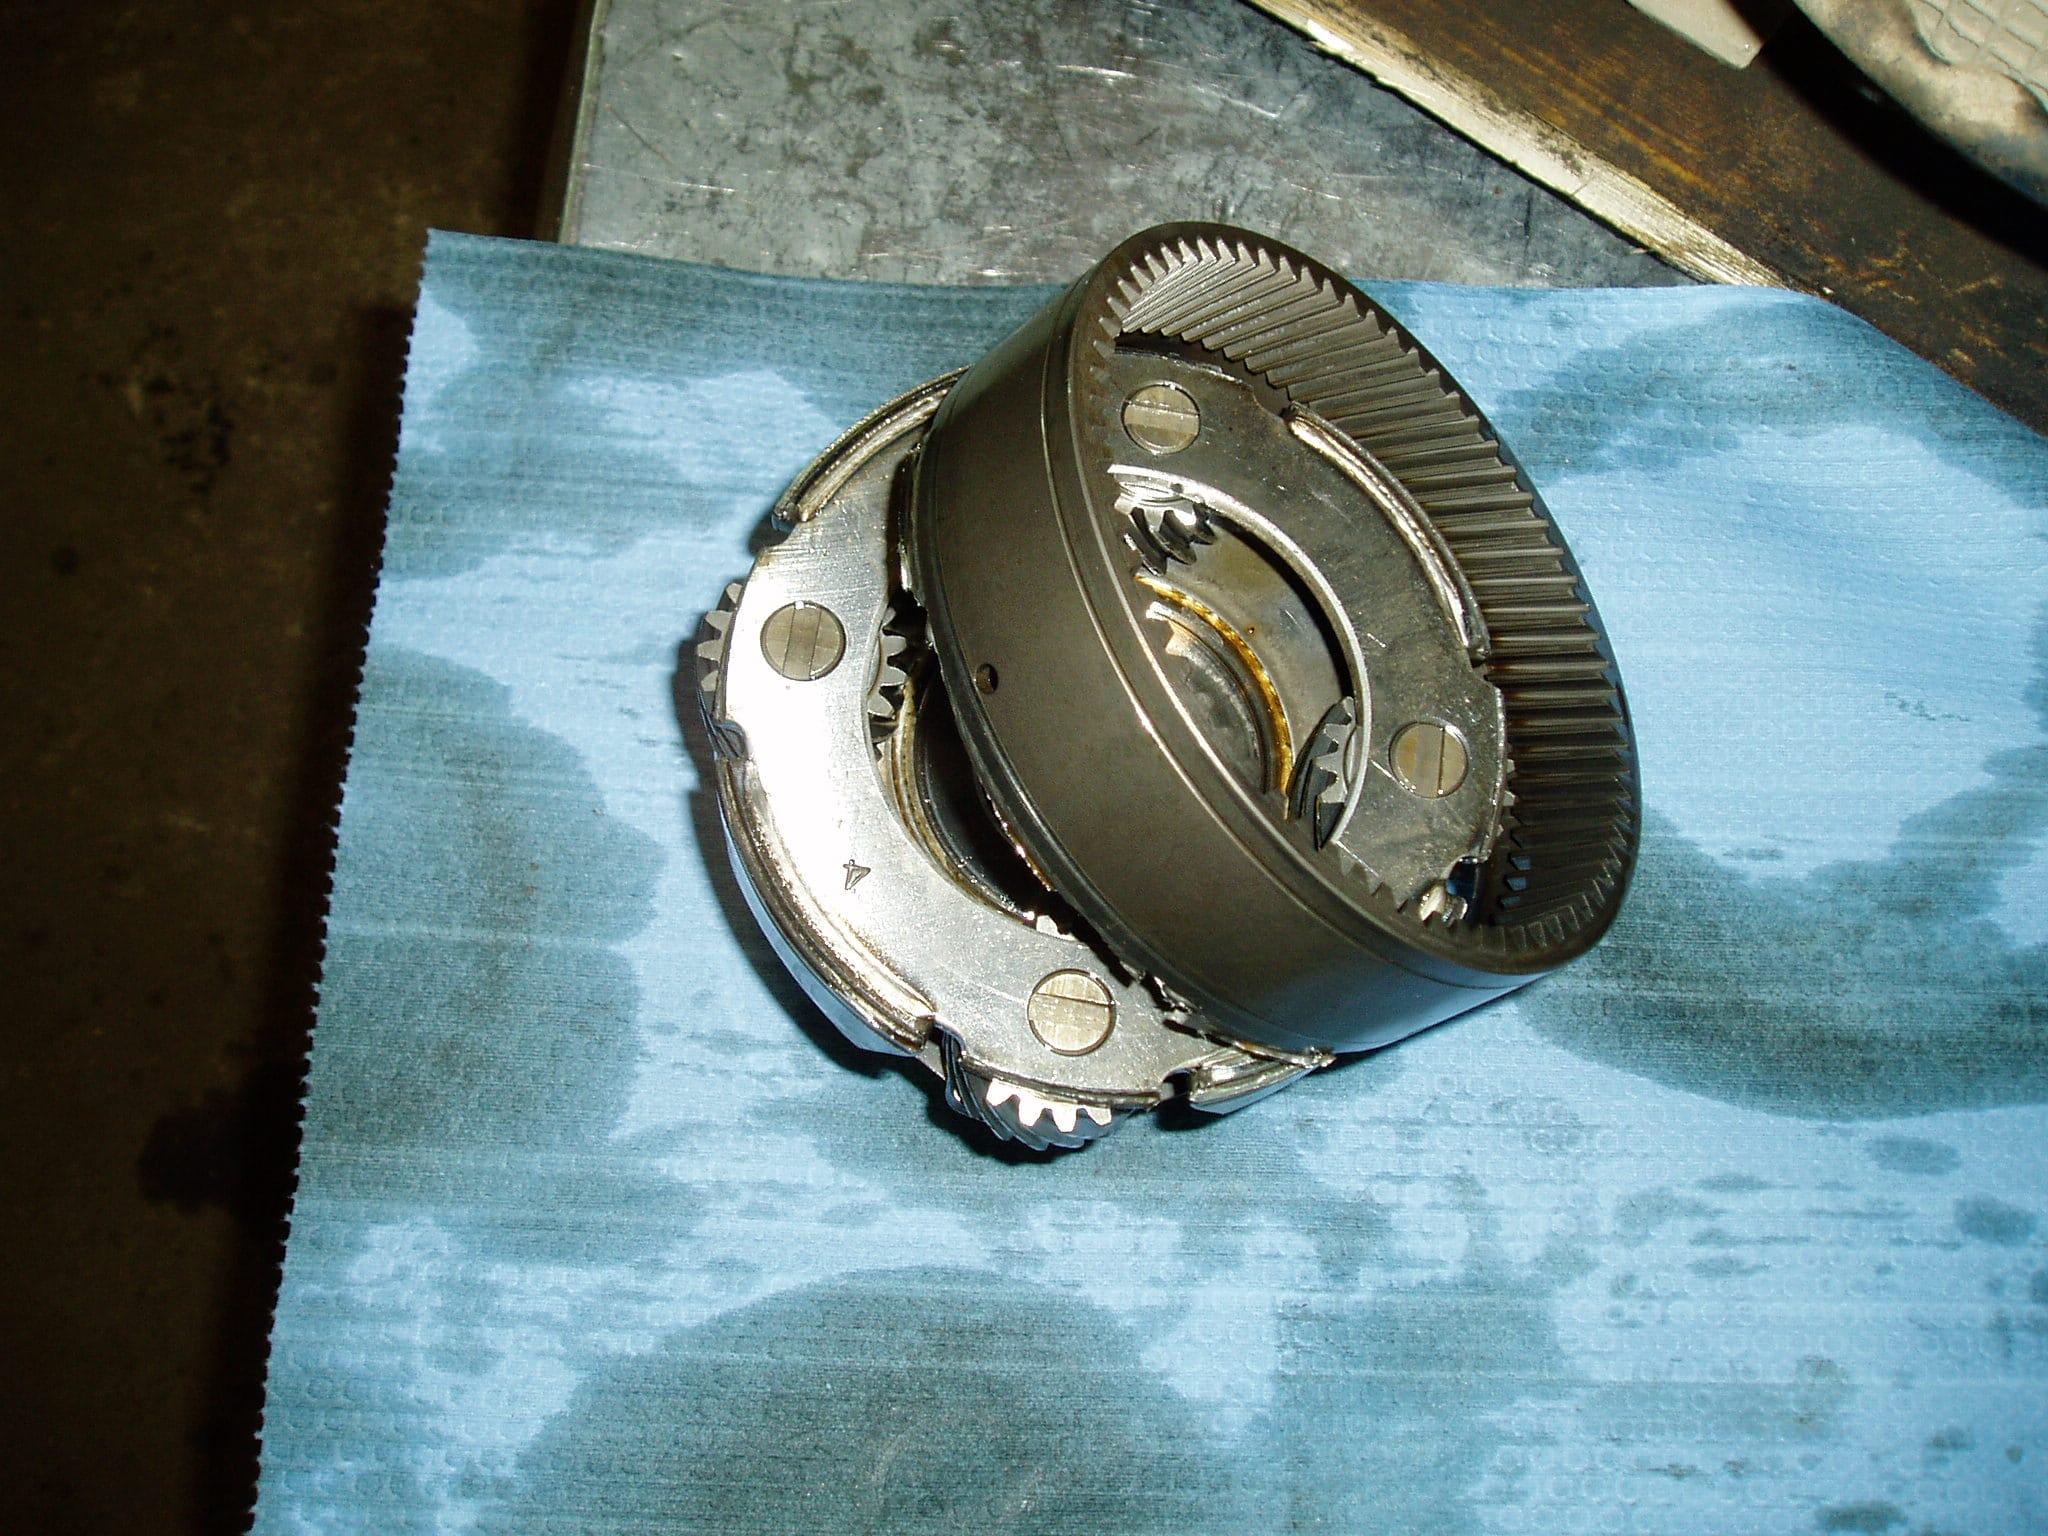 Ремонт АКПП Pajero Sport 2  3.2 L. Обломился по сварке корпус планетарной передачи